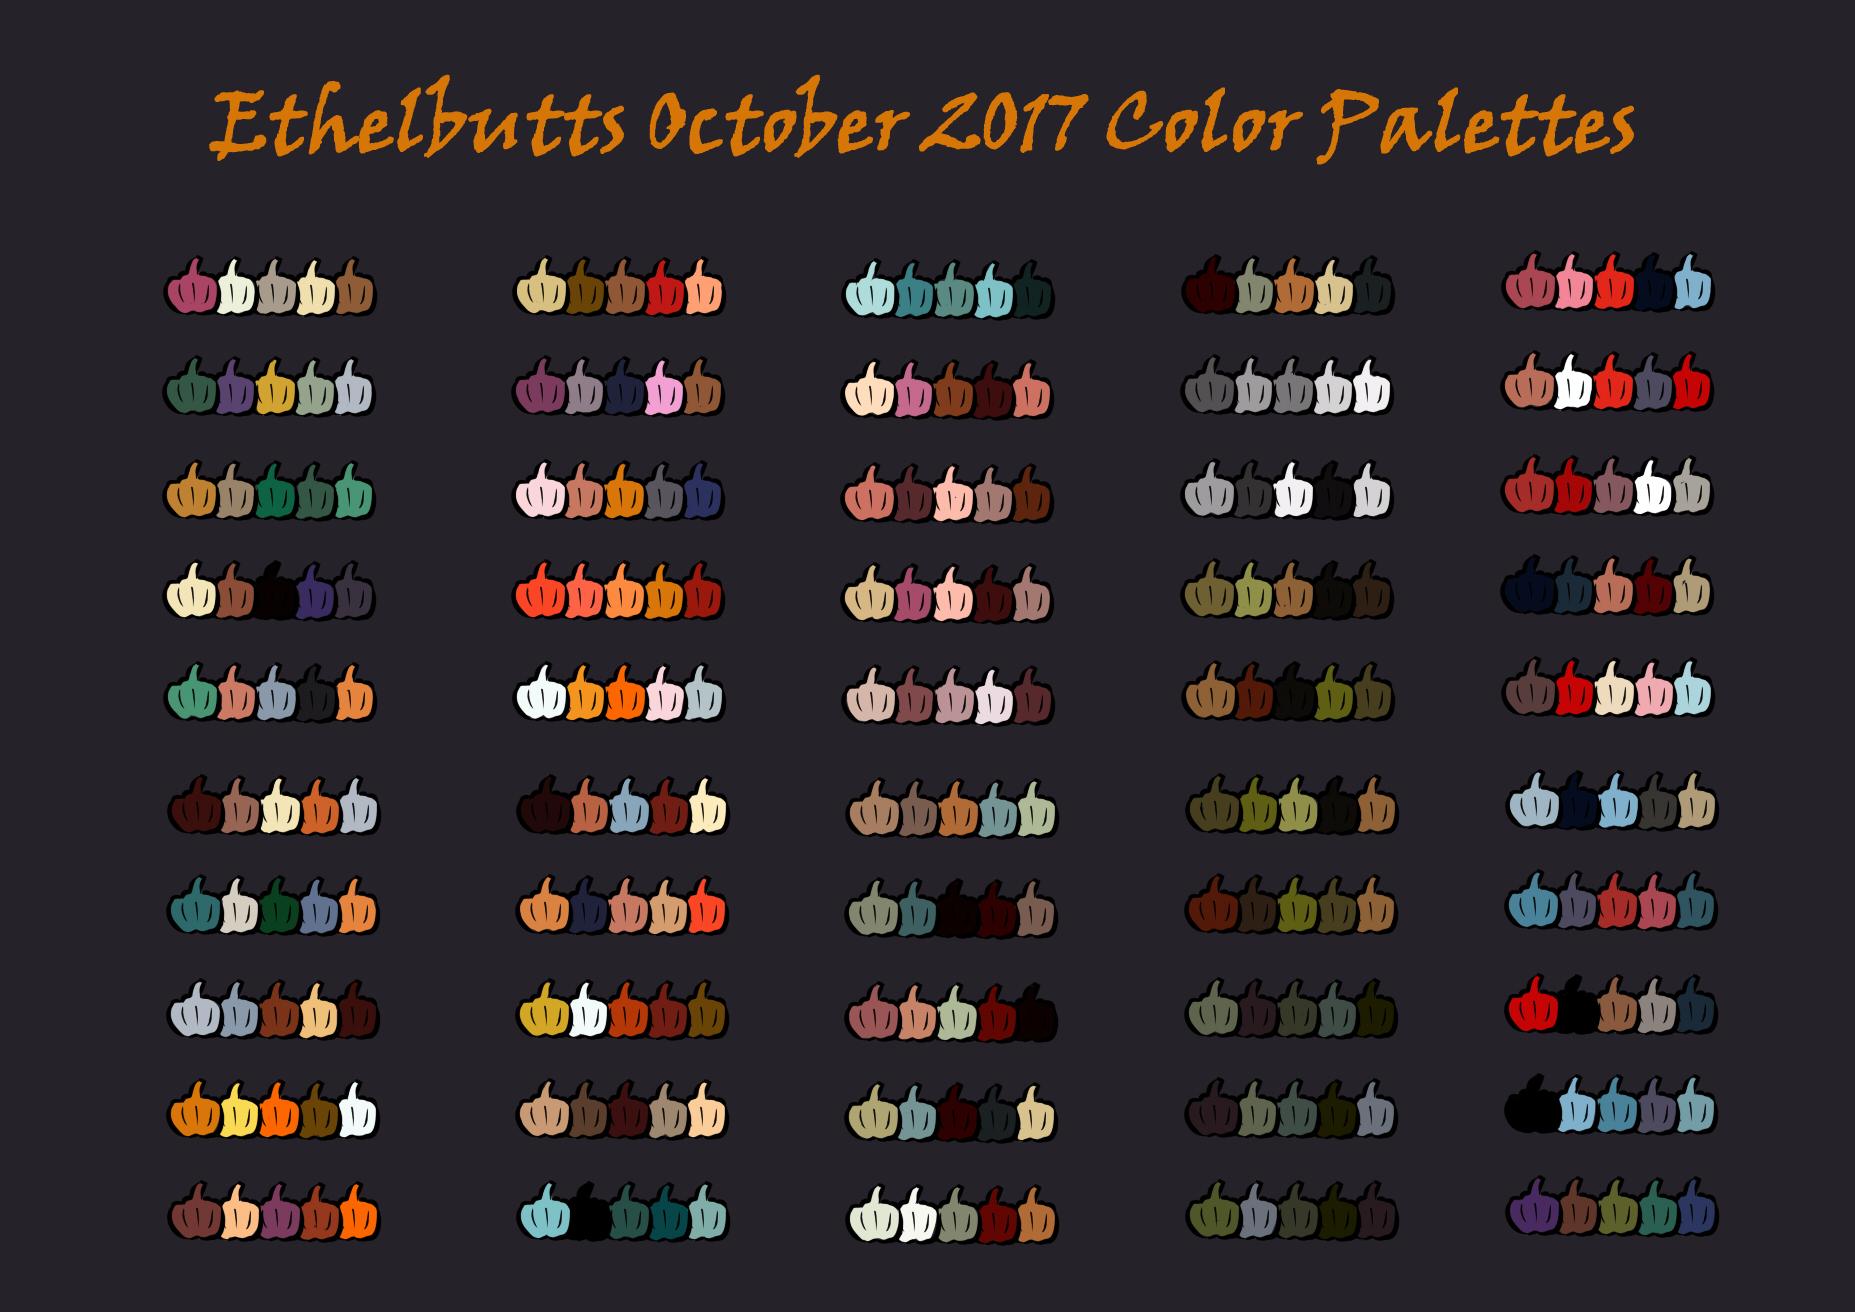 Halloween Color Palettes 2017 Weasyl